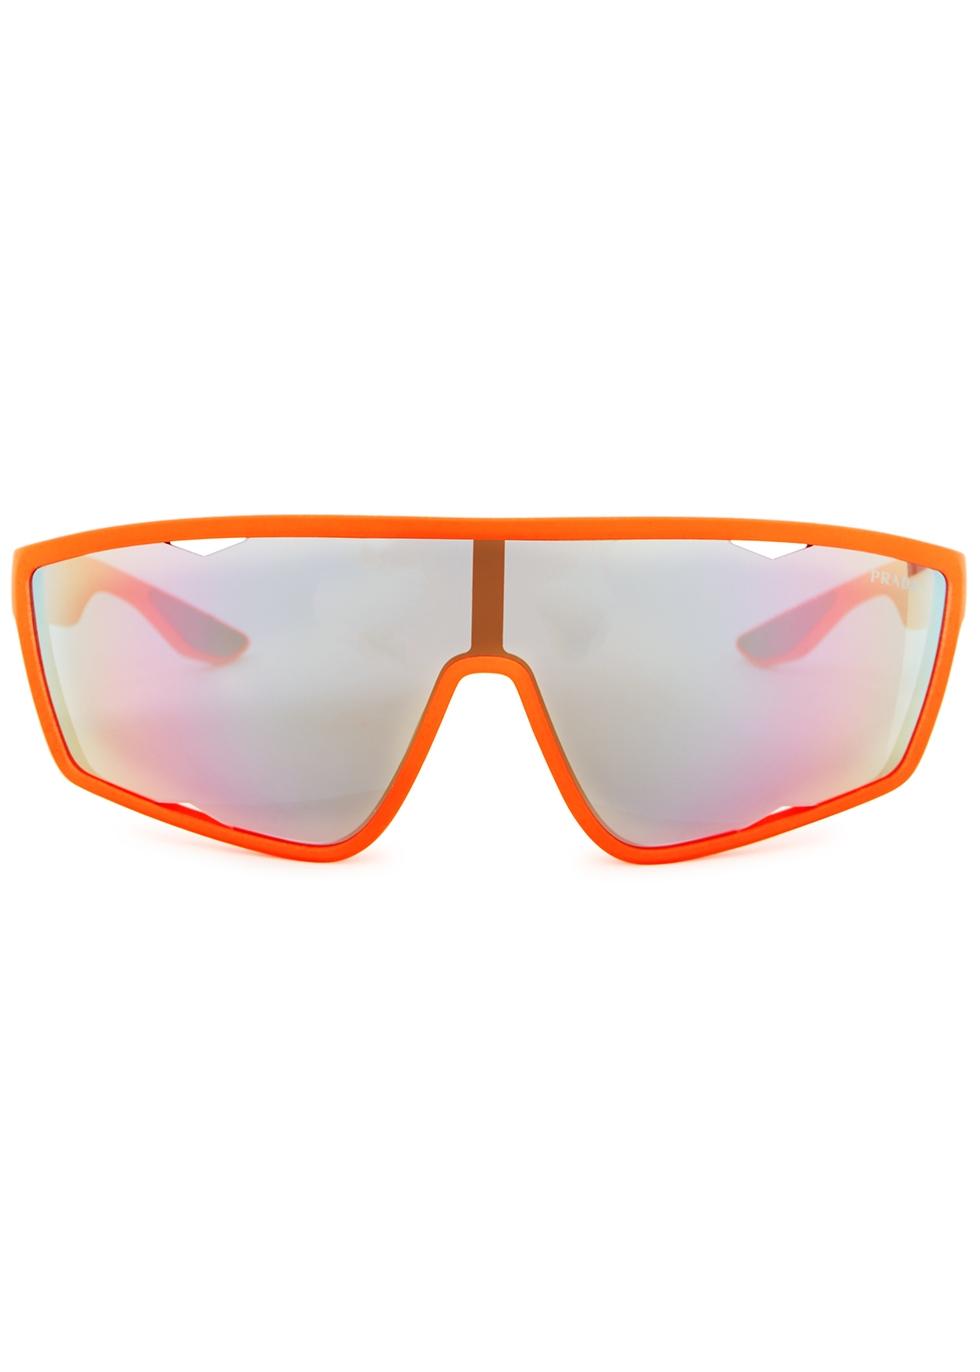 Neon orange matte sunglasses - Prada Linea Rossa